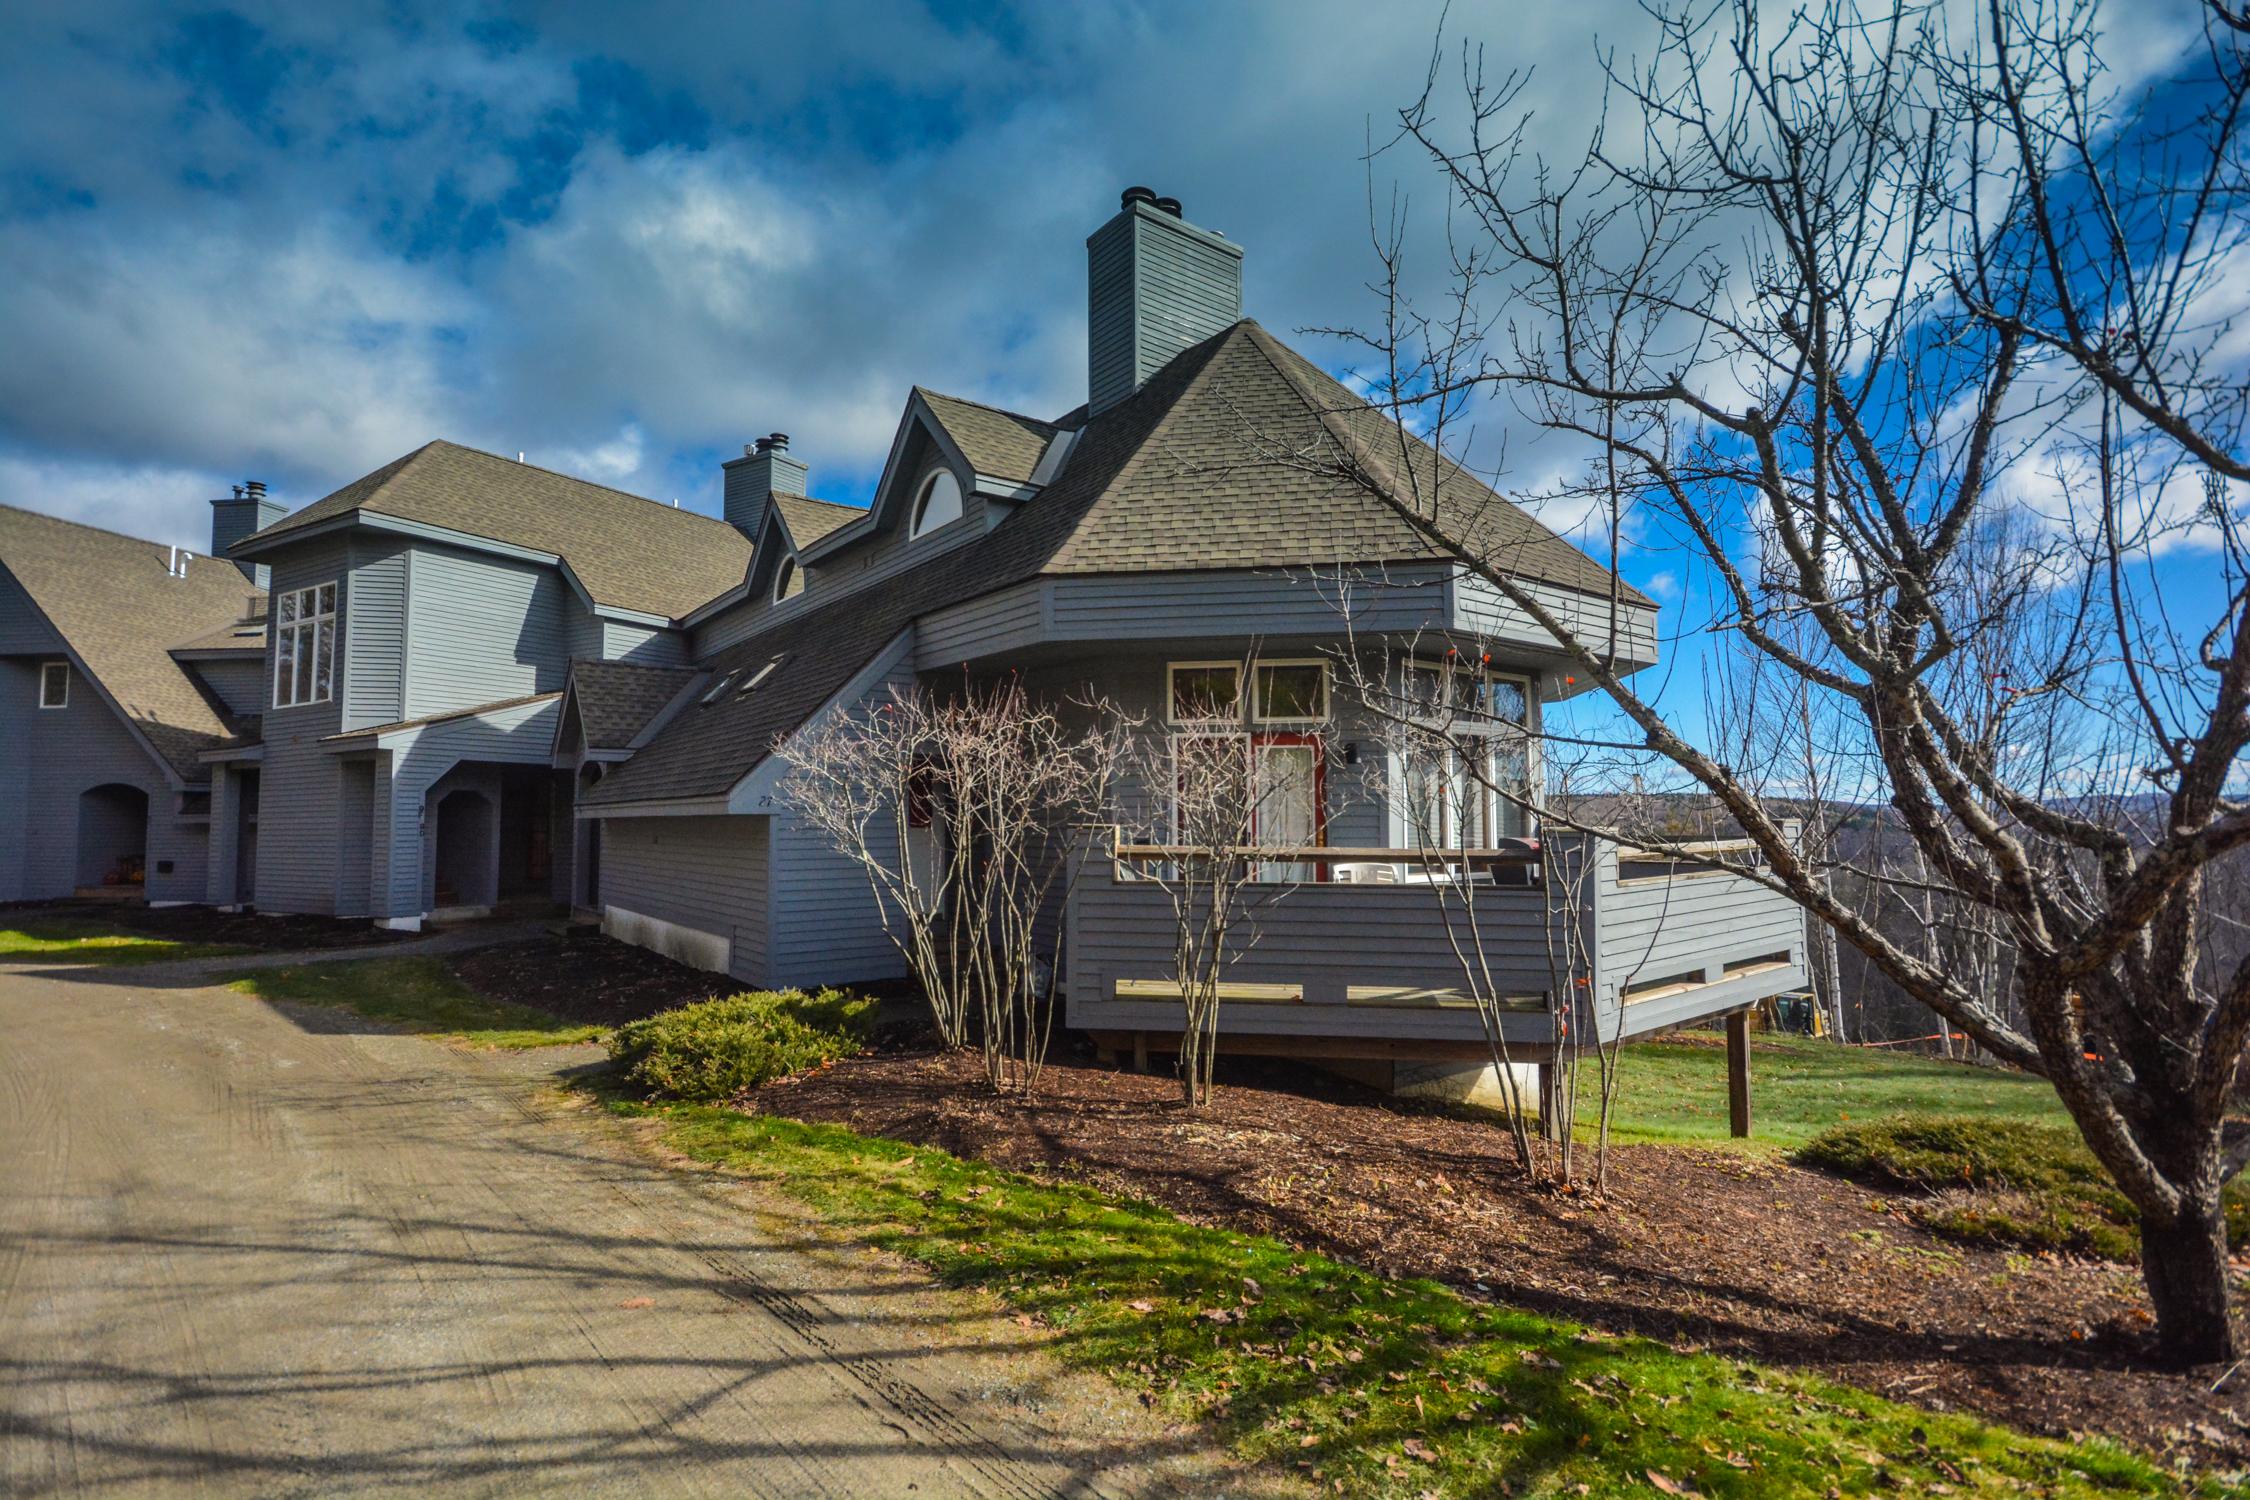 共管物業 為 出售 在 Spectacular Powderhorn Townhouse 27 Haymaker 9F Wilmington, 佛蒙特州, 05363 美國